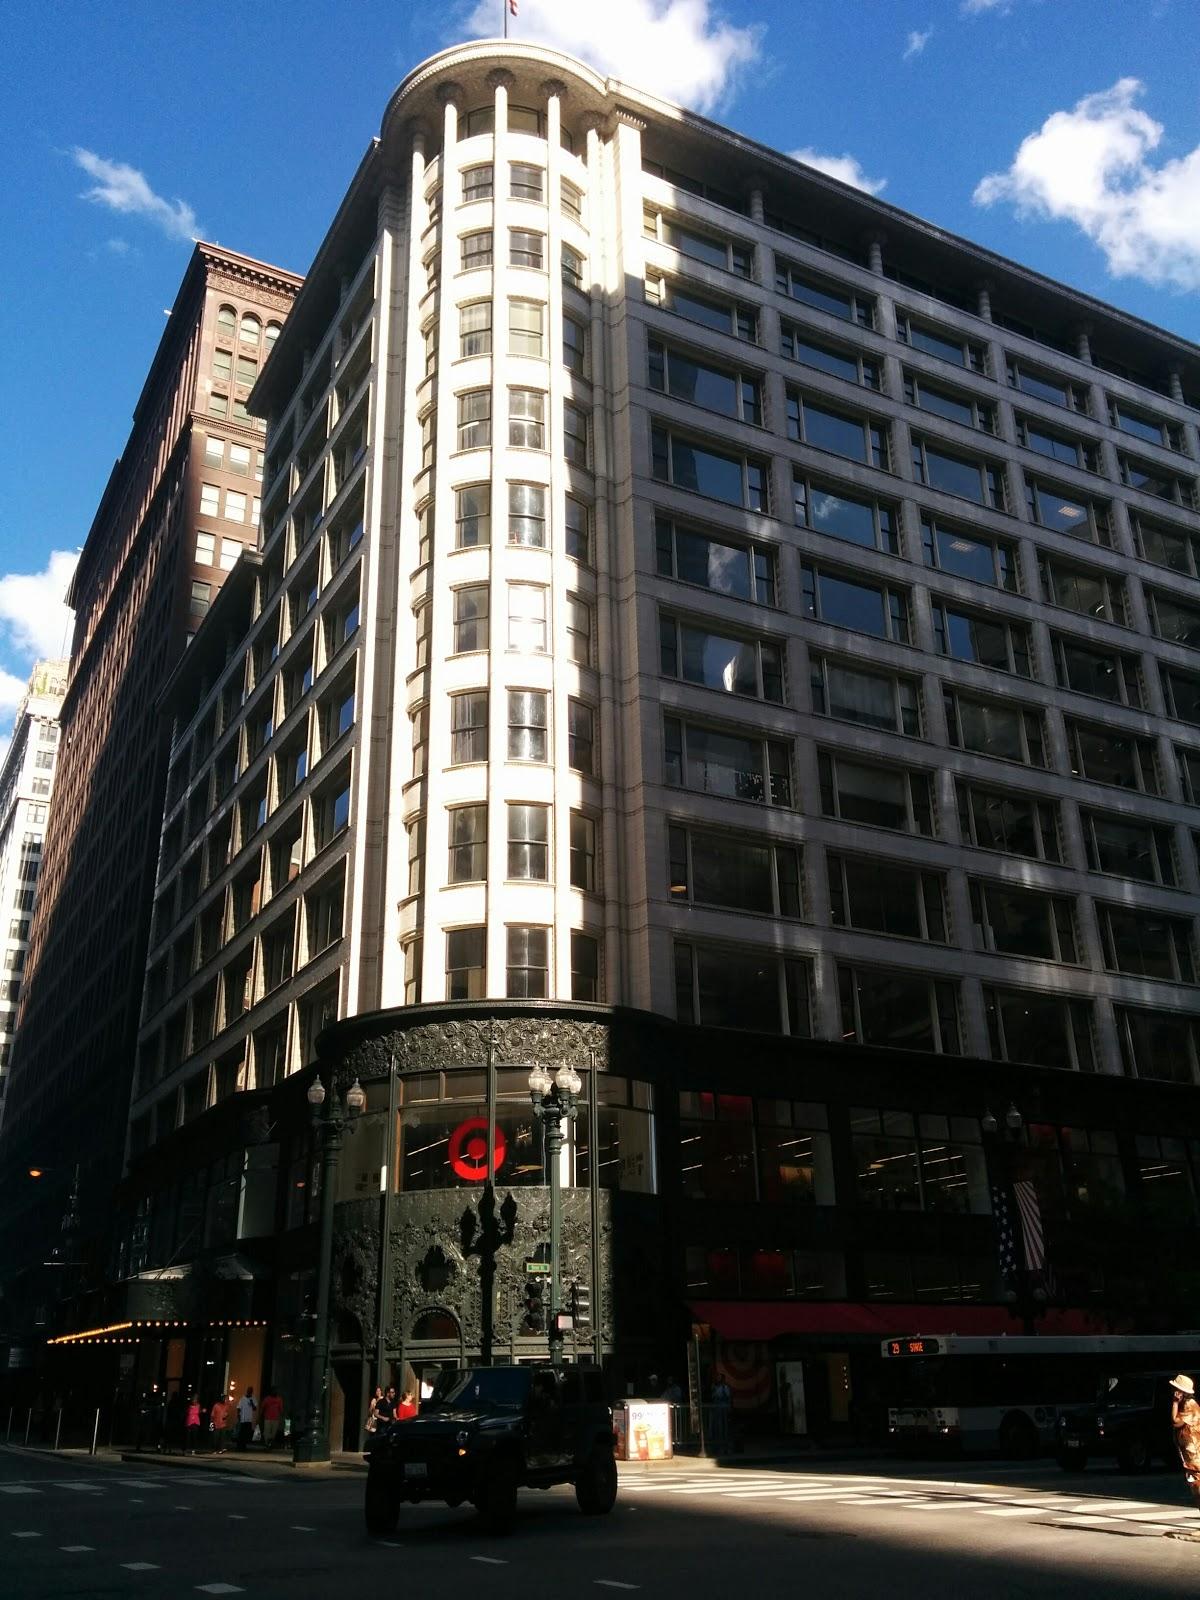 Carson Pirie Scott Building - Louis Sullivan